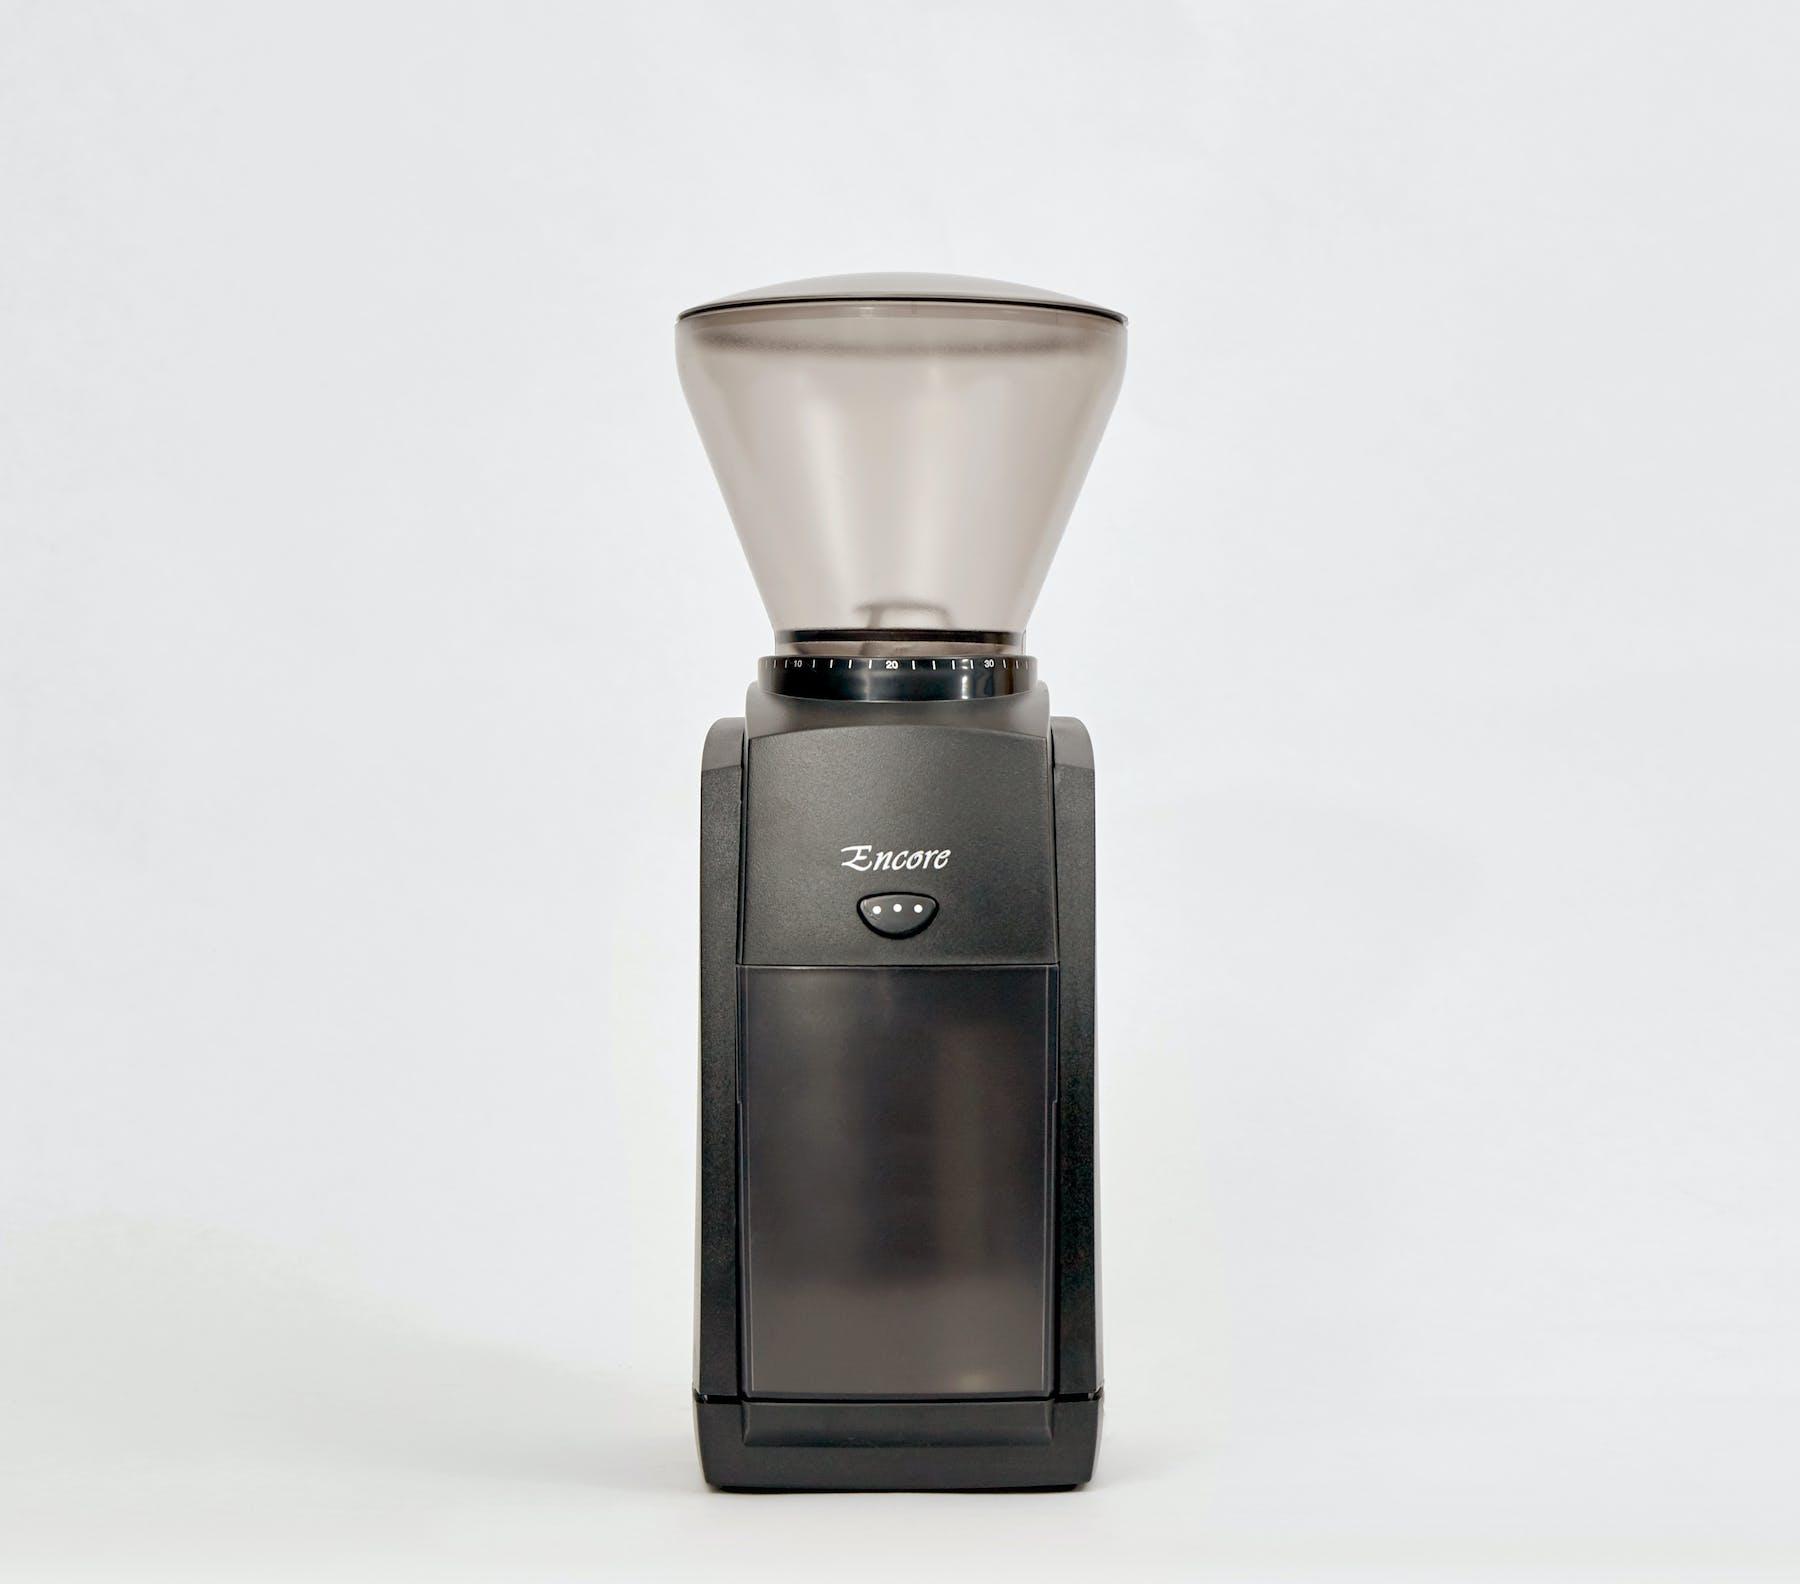 dispatch coffee baratza grinder 01